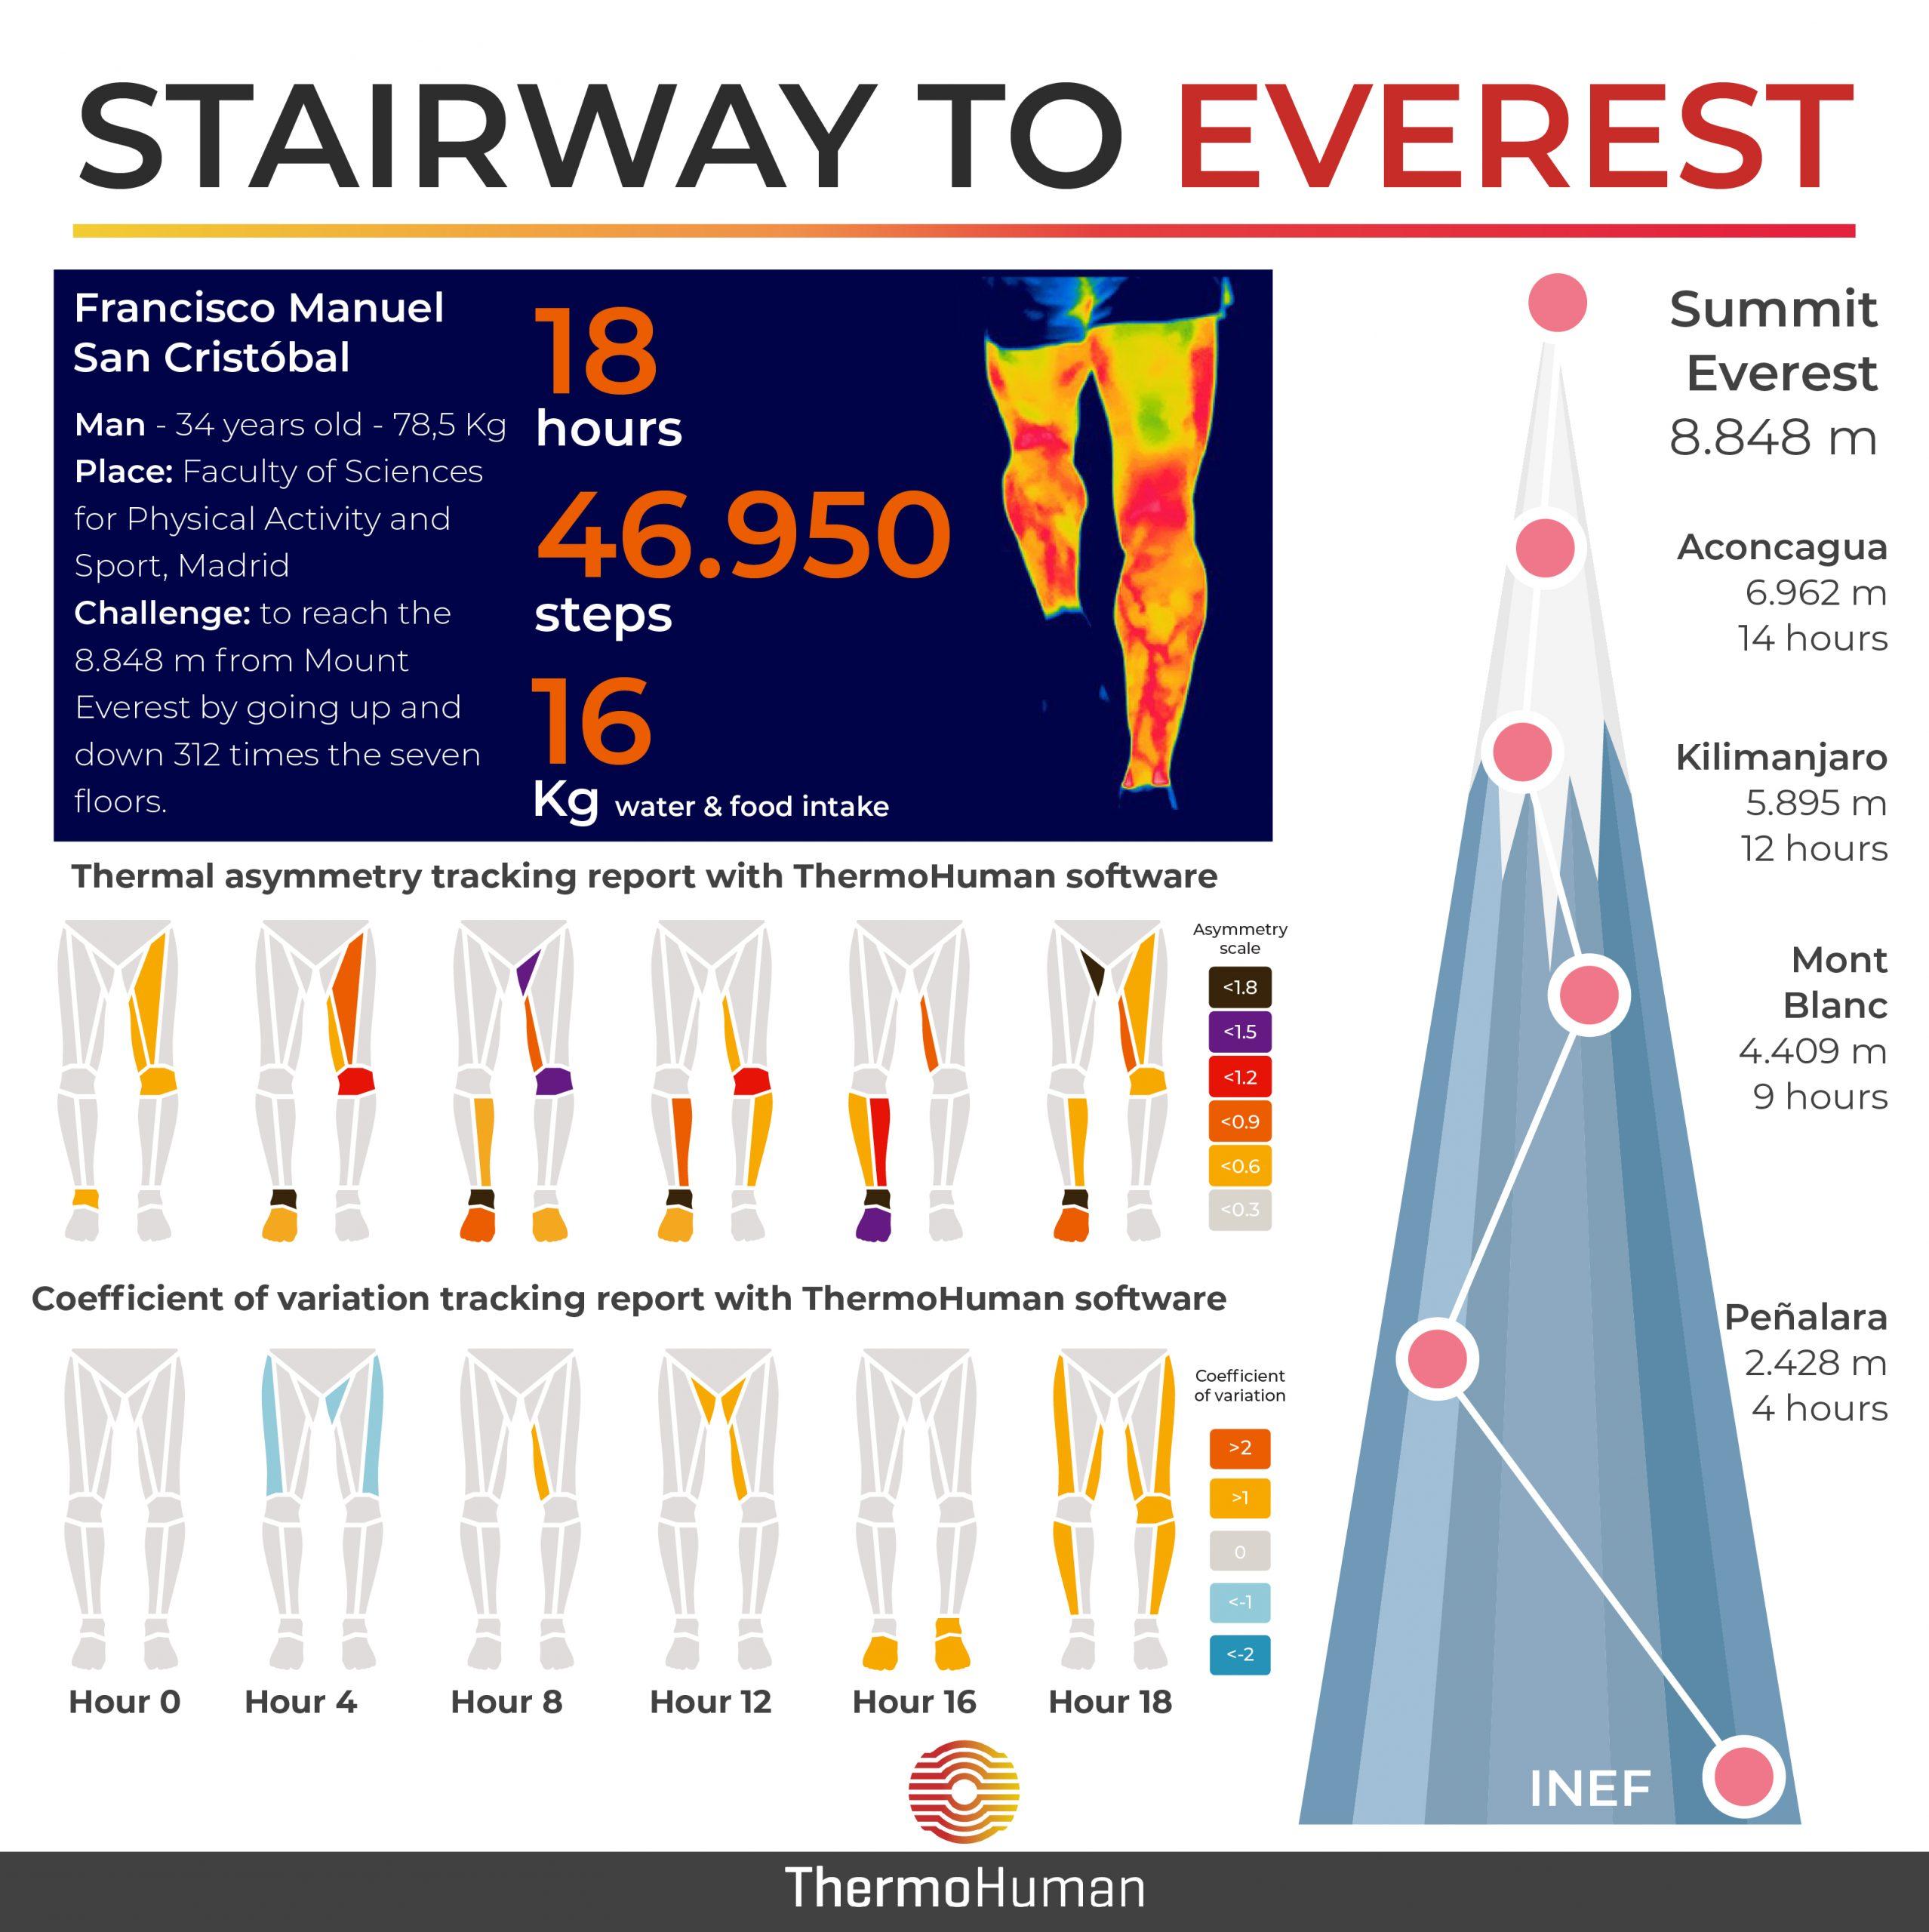 Stairway to Everest